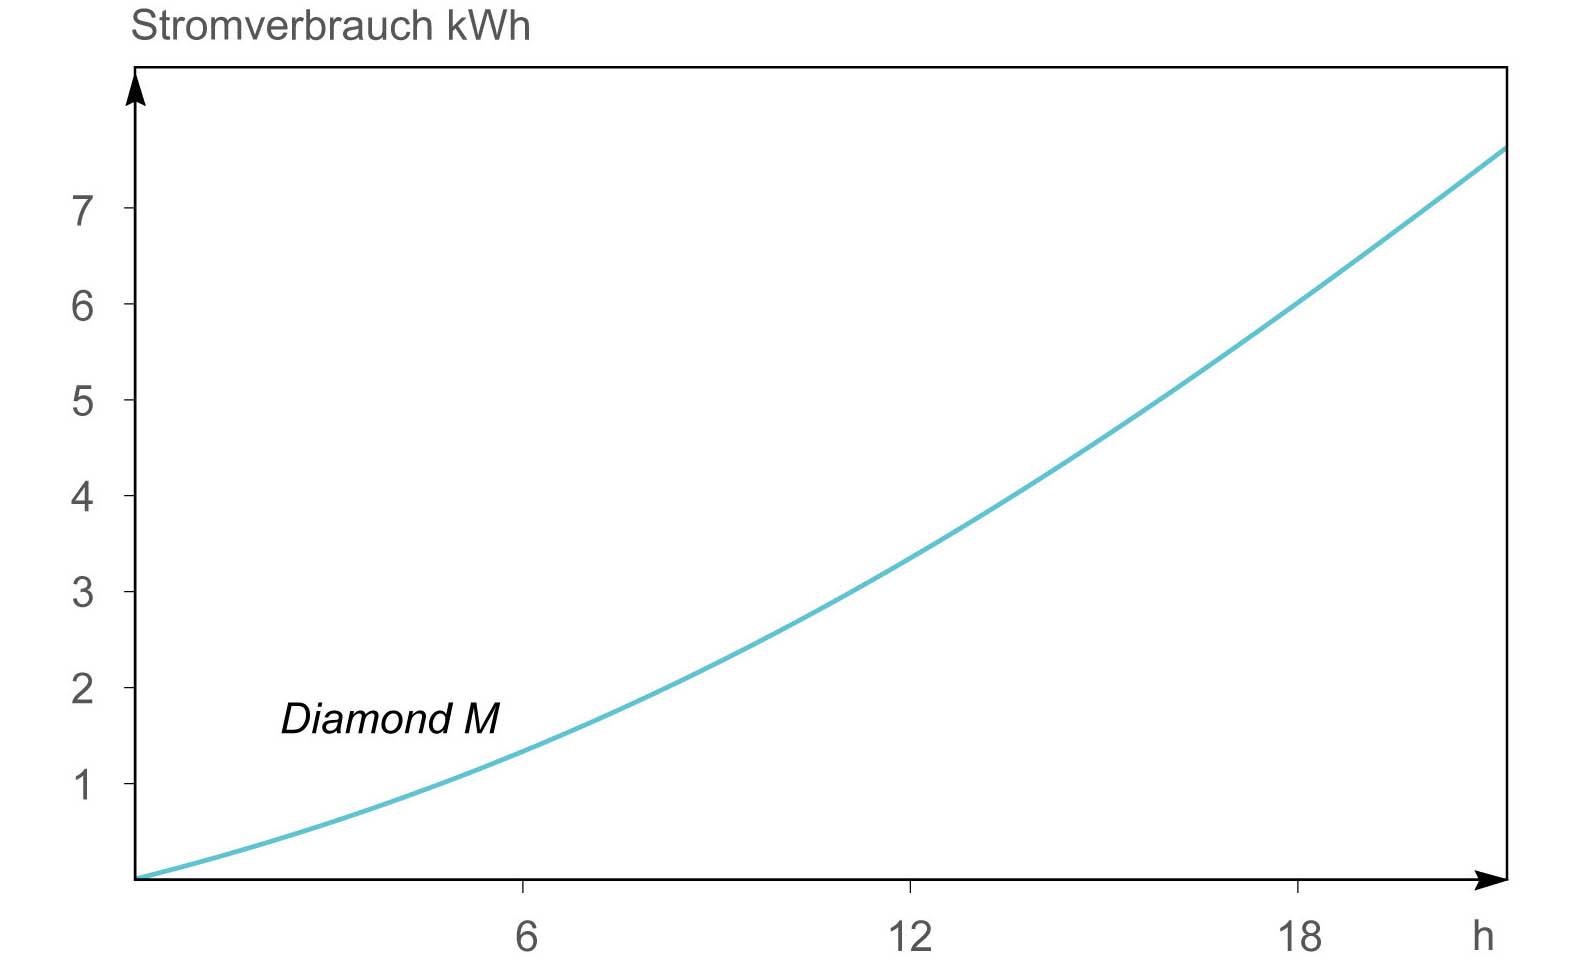 Grafik-Stromverbrauch-&-Grafik-Garverluste